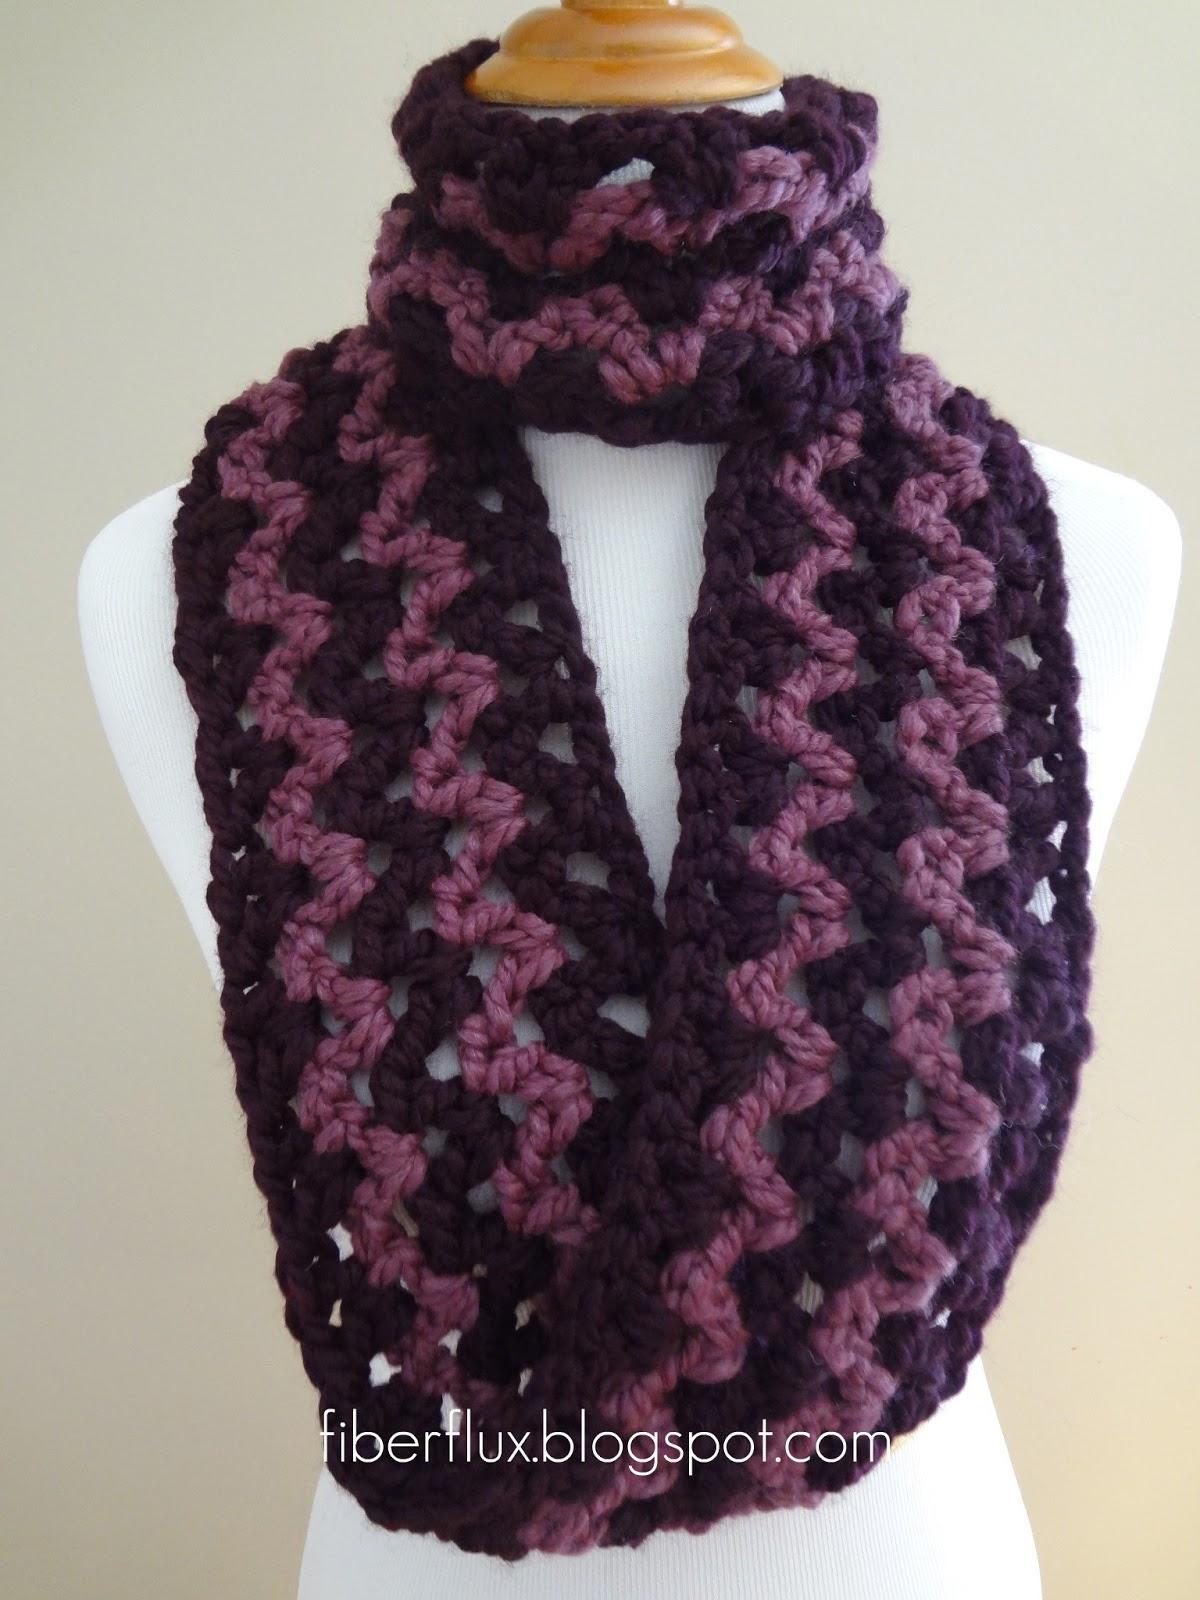 Free Crochet PatternPinot Noir Infinity Scarf Free Infinity Scarf Directions